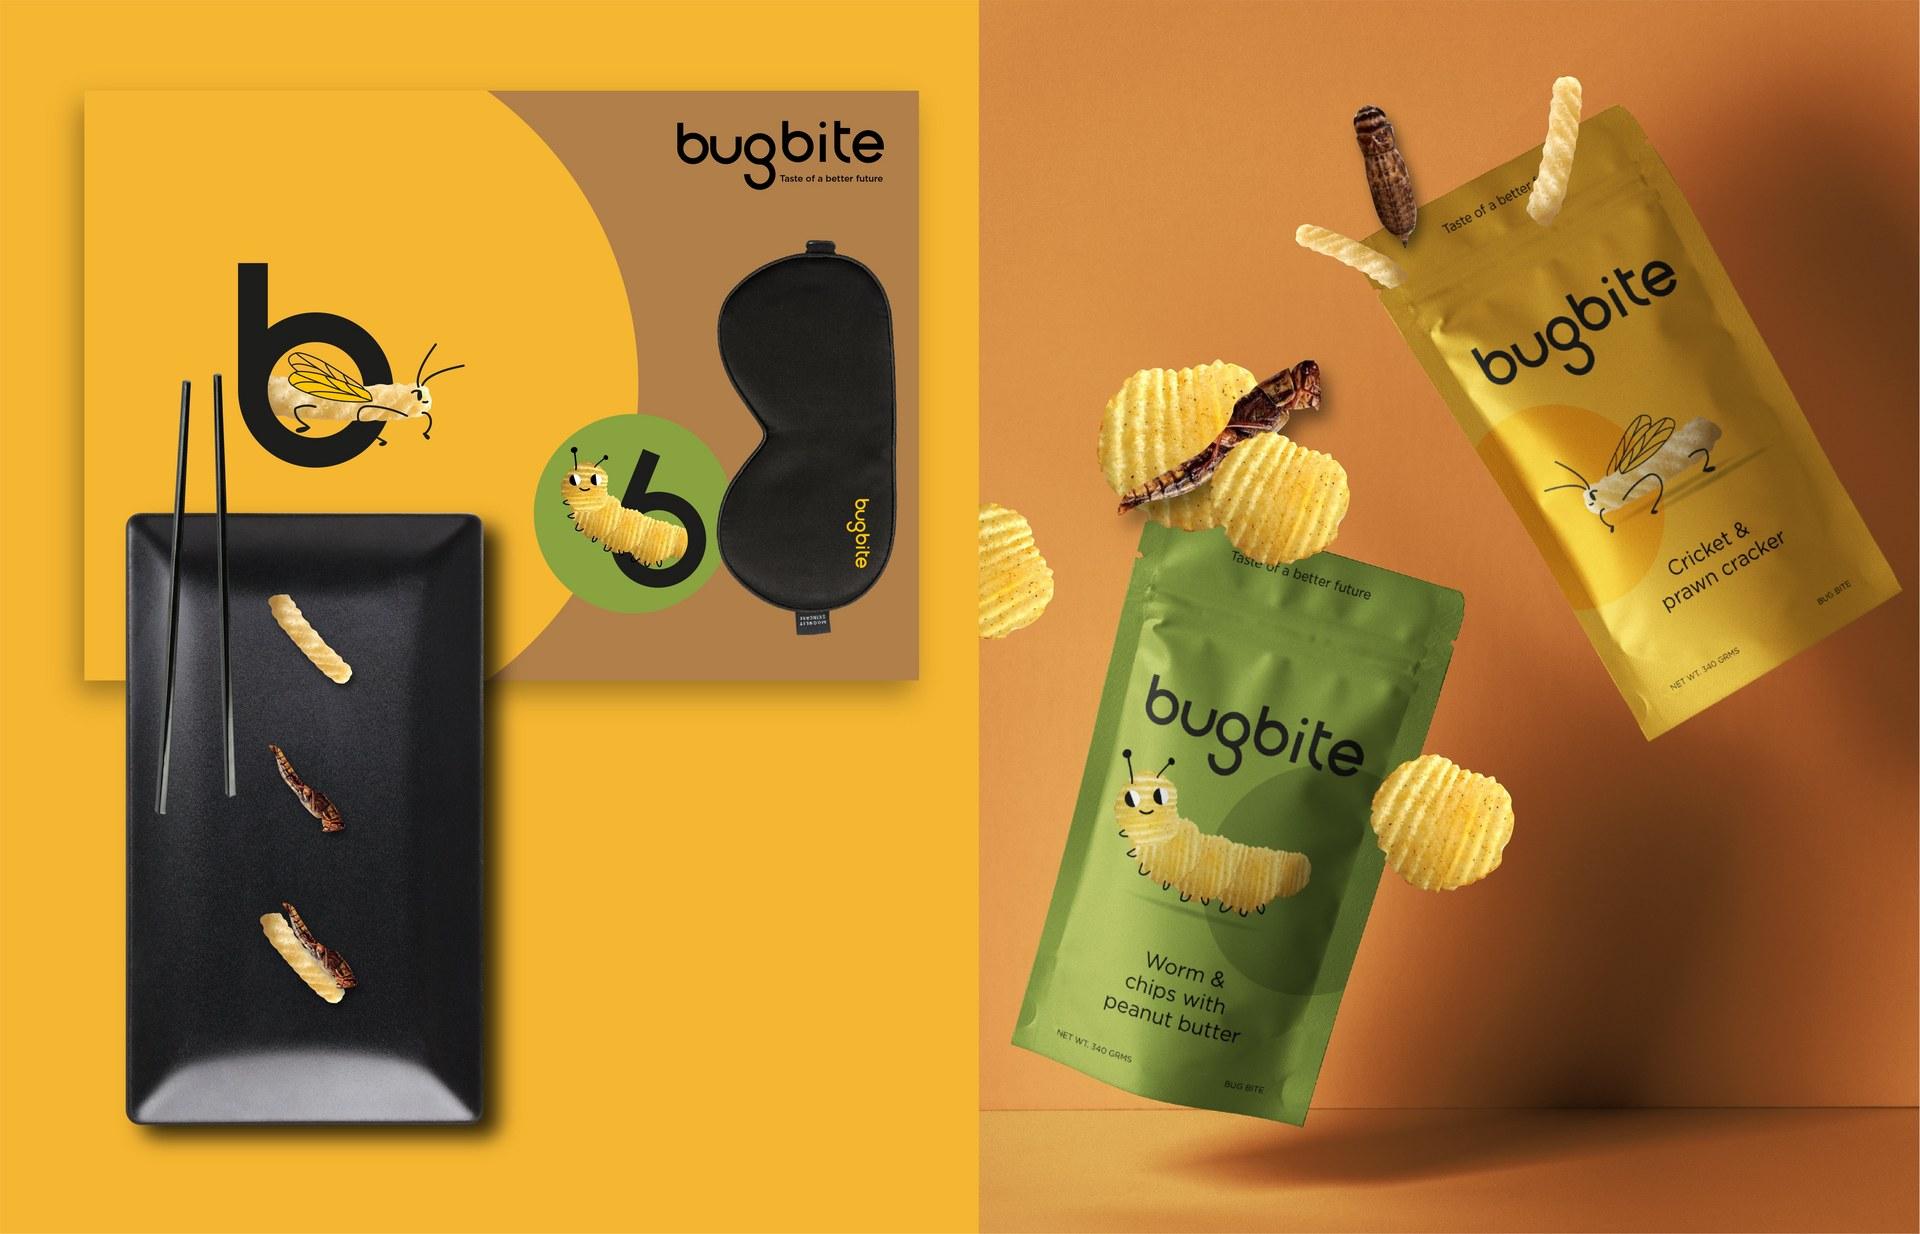 Cutlery sets & Snack packaging